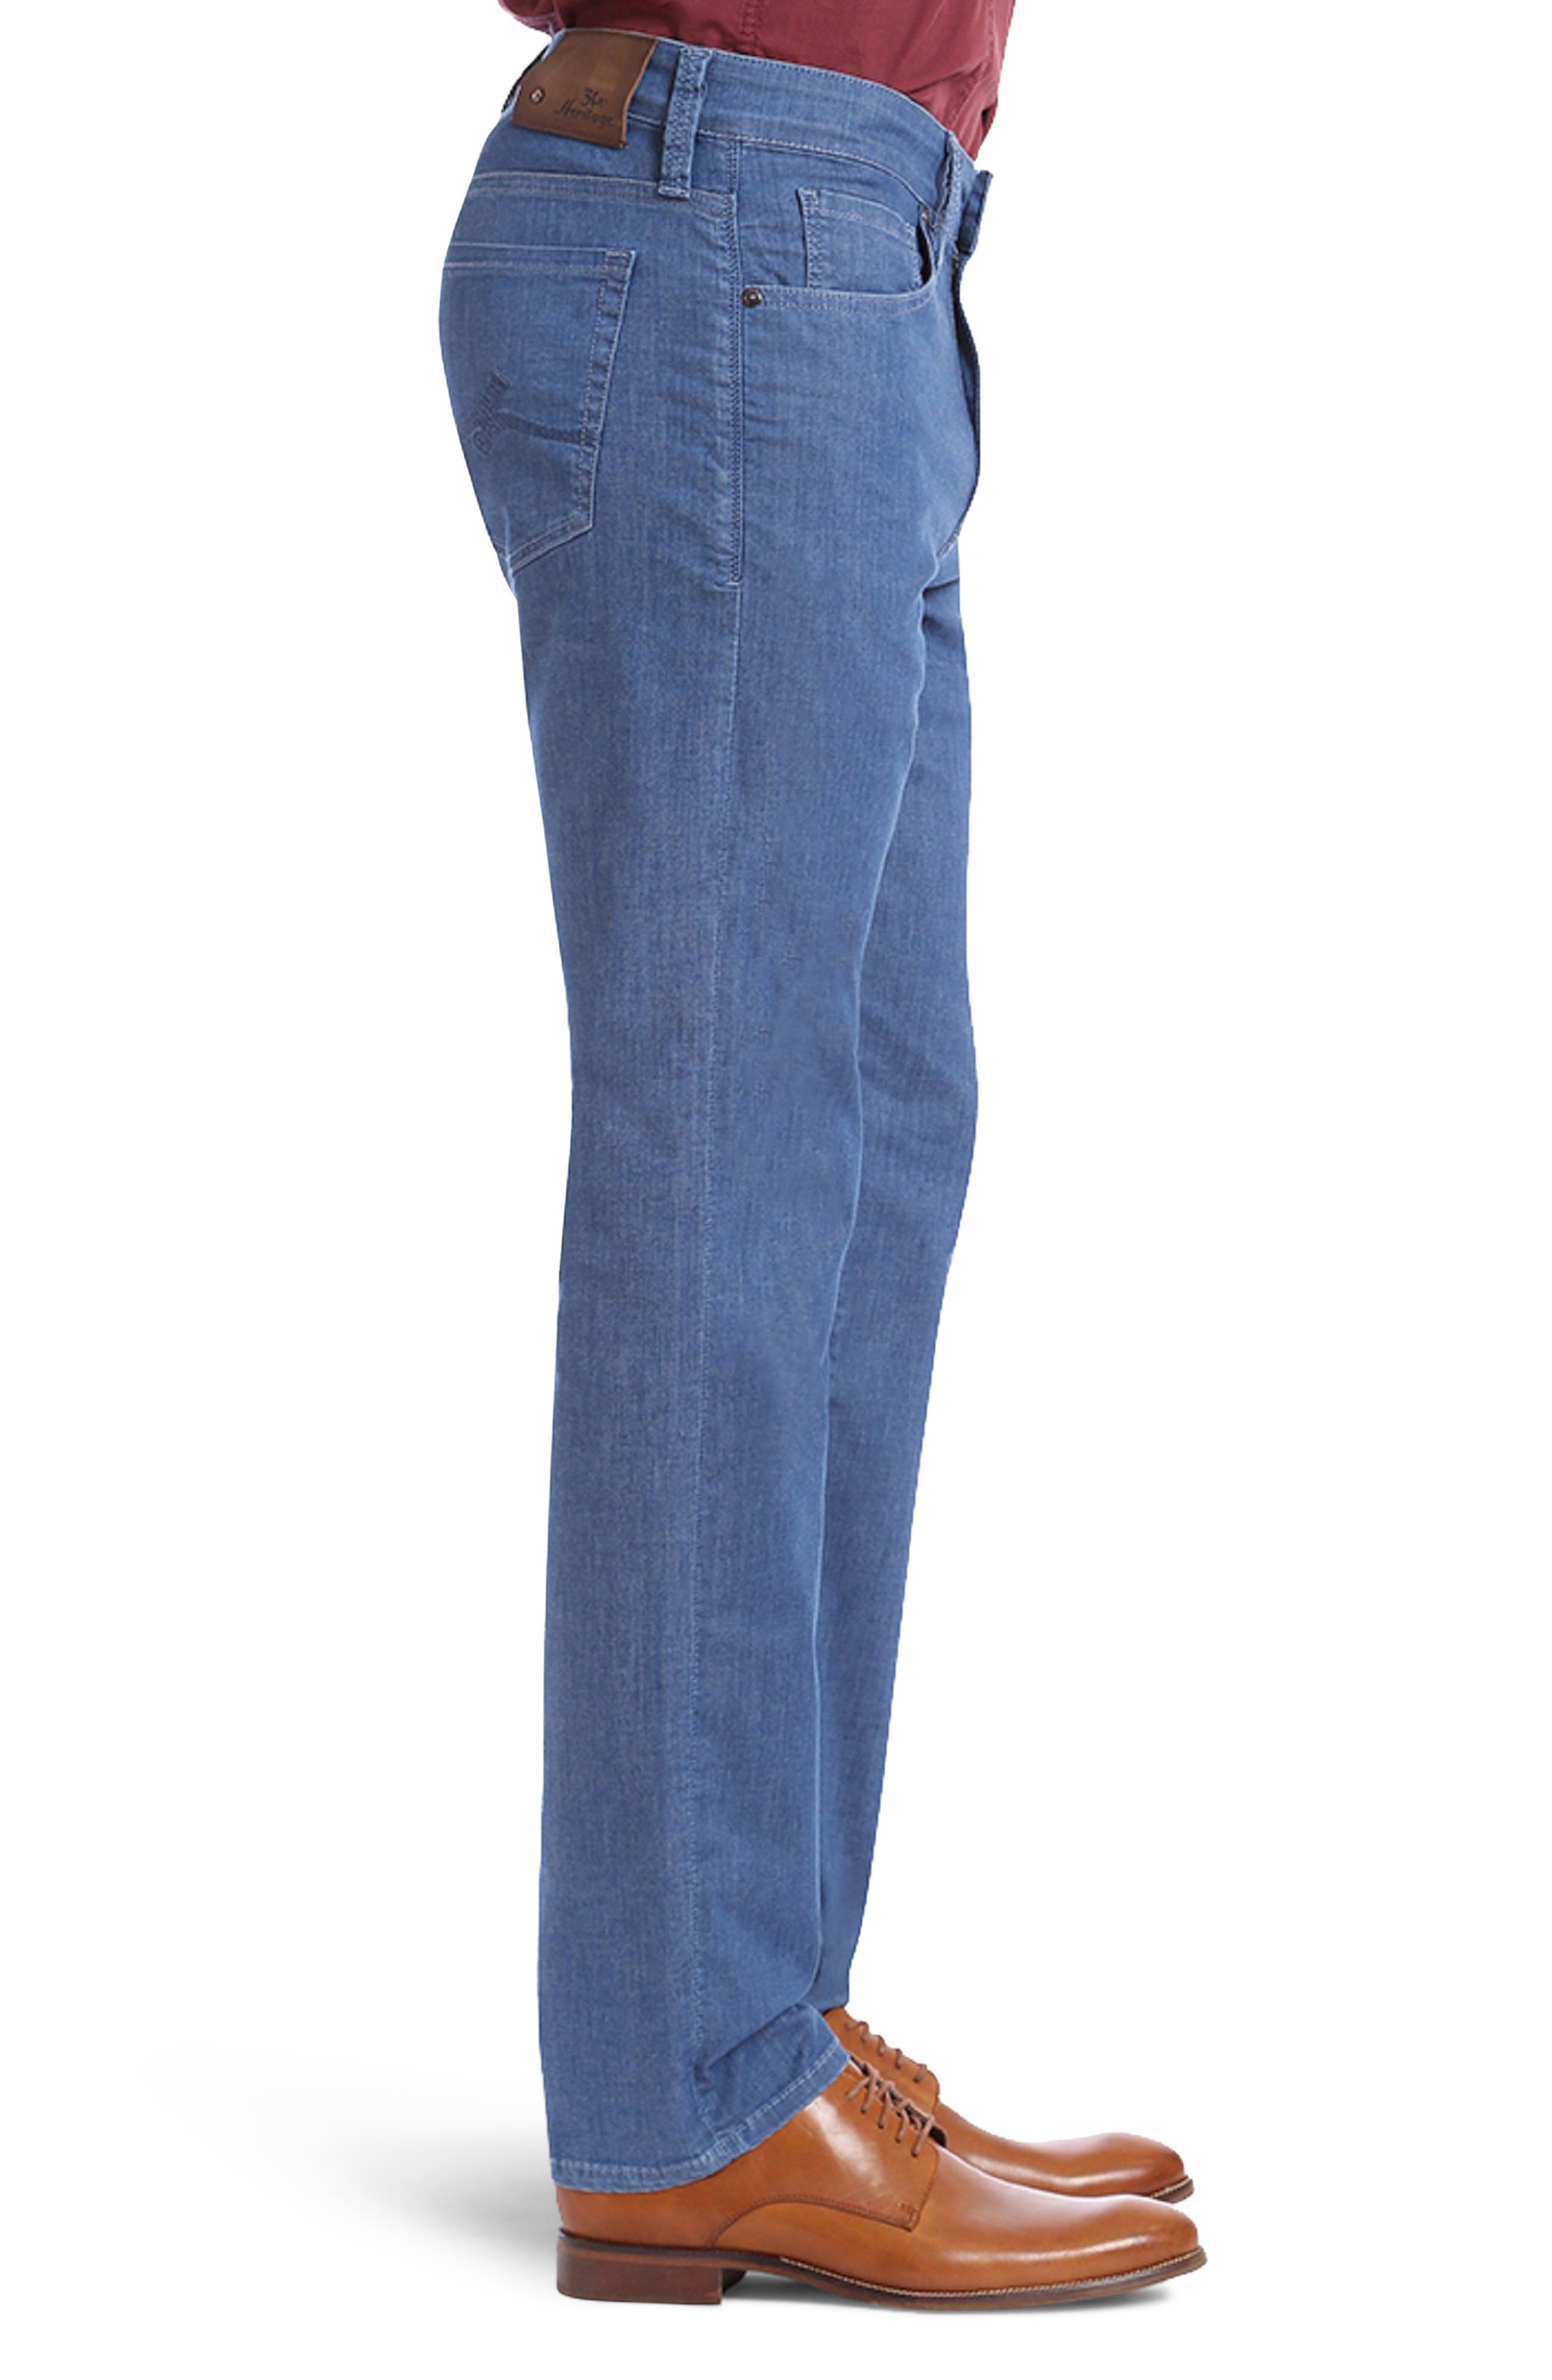 Courage Straight Fit Jeans,                             Alternate thumbnail 3, color,                             Mid Maui Denim